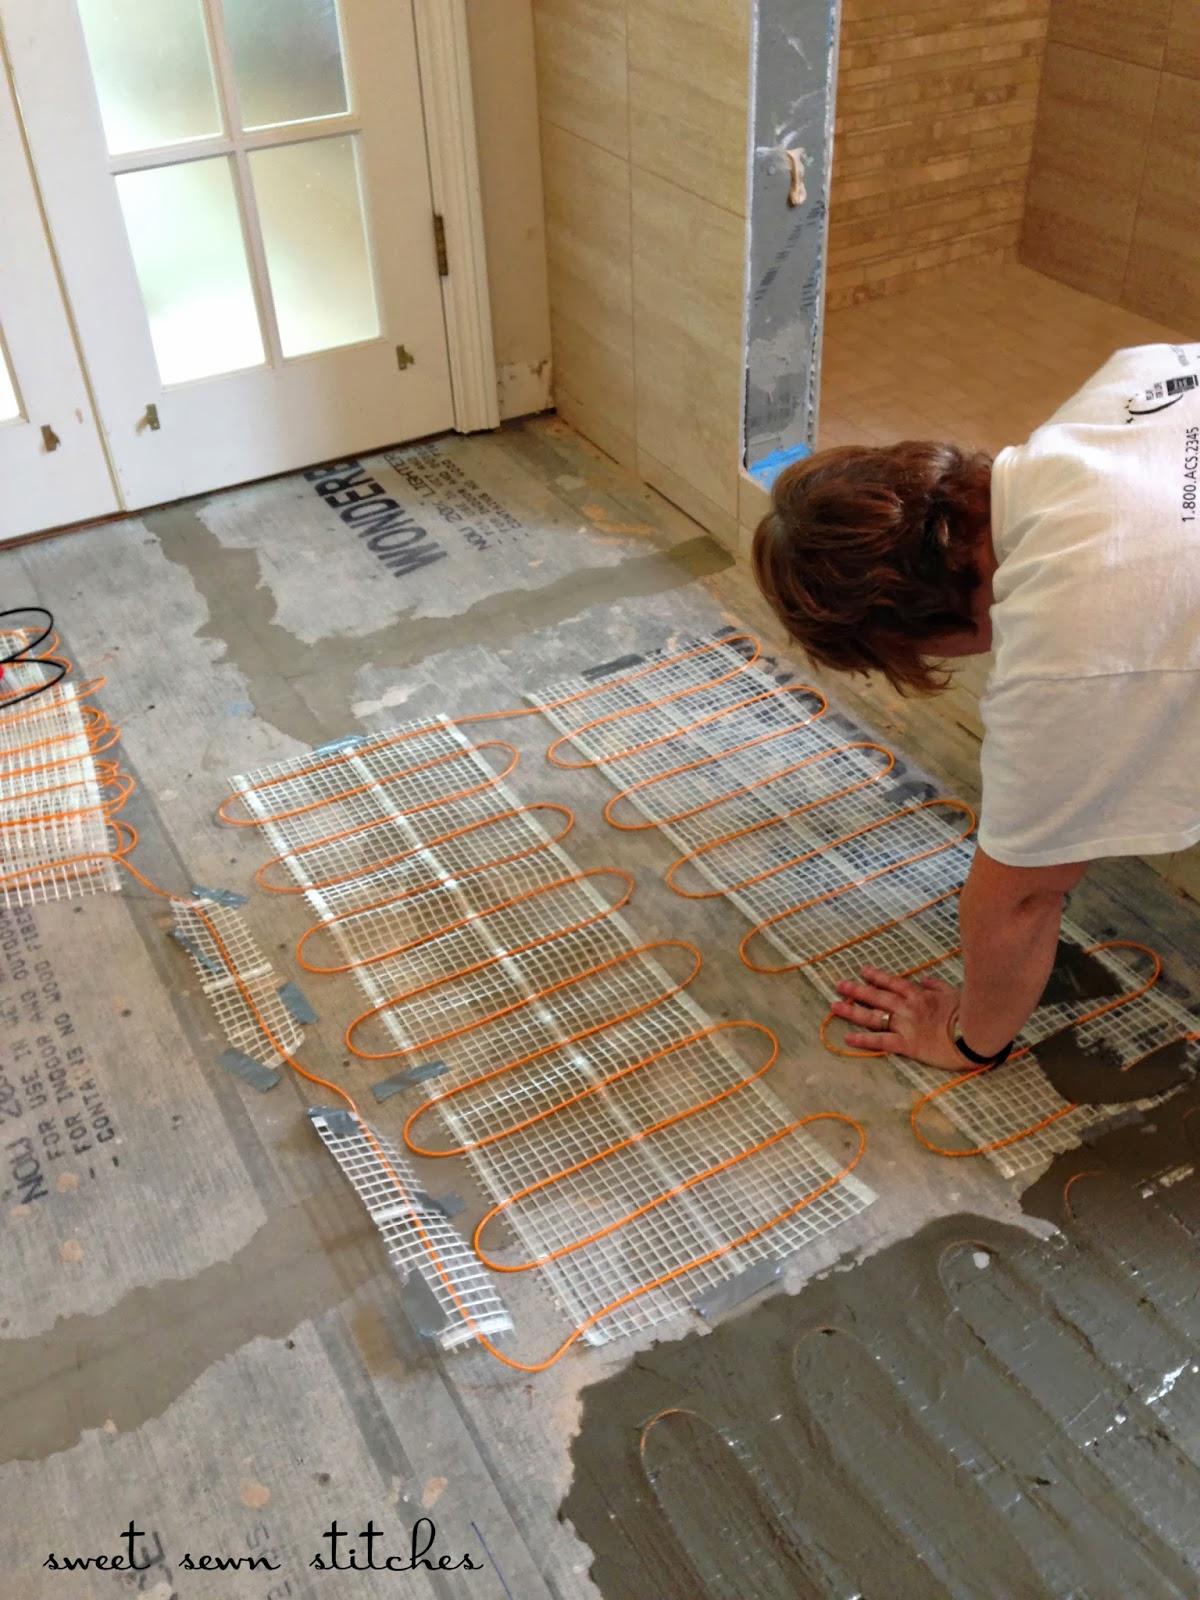 Sweet Sewn Stitches Bath Heated Tile Floor  Part 4